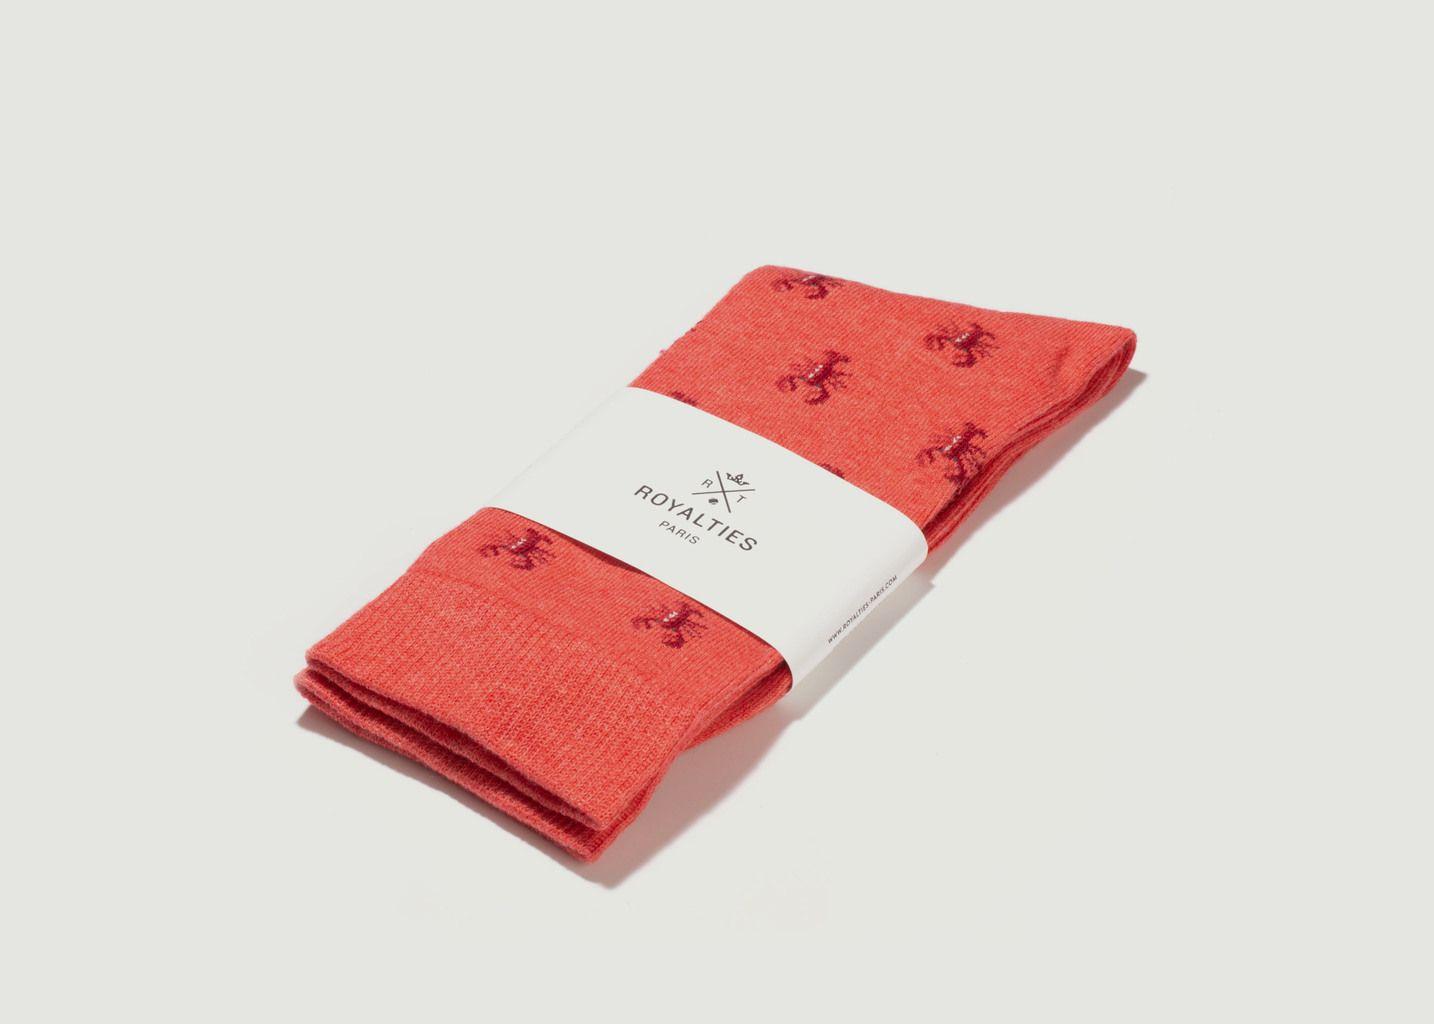 Chaussettes Homard - Royalties